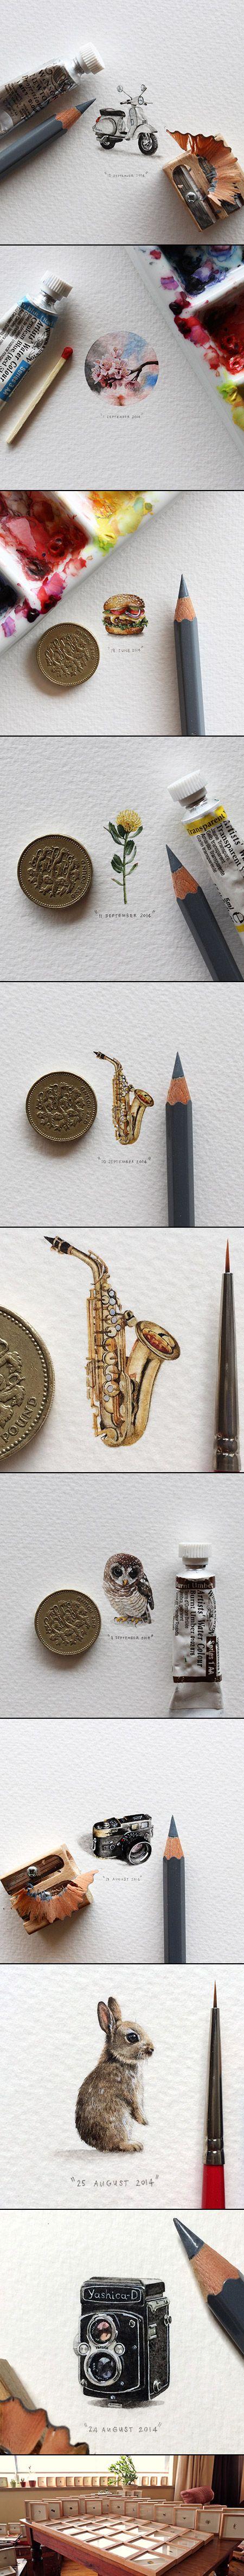 Best Miniature Paintings Ideas On Pinterest Coin Art Copper - Artist creates miniature paintings everyday entire year